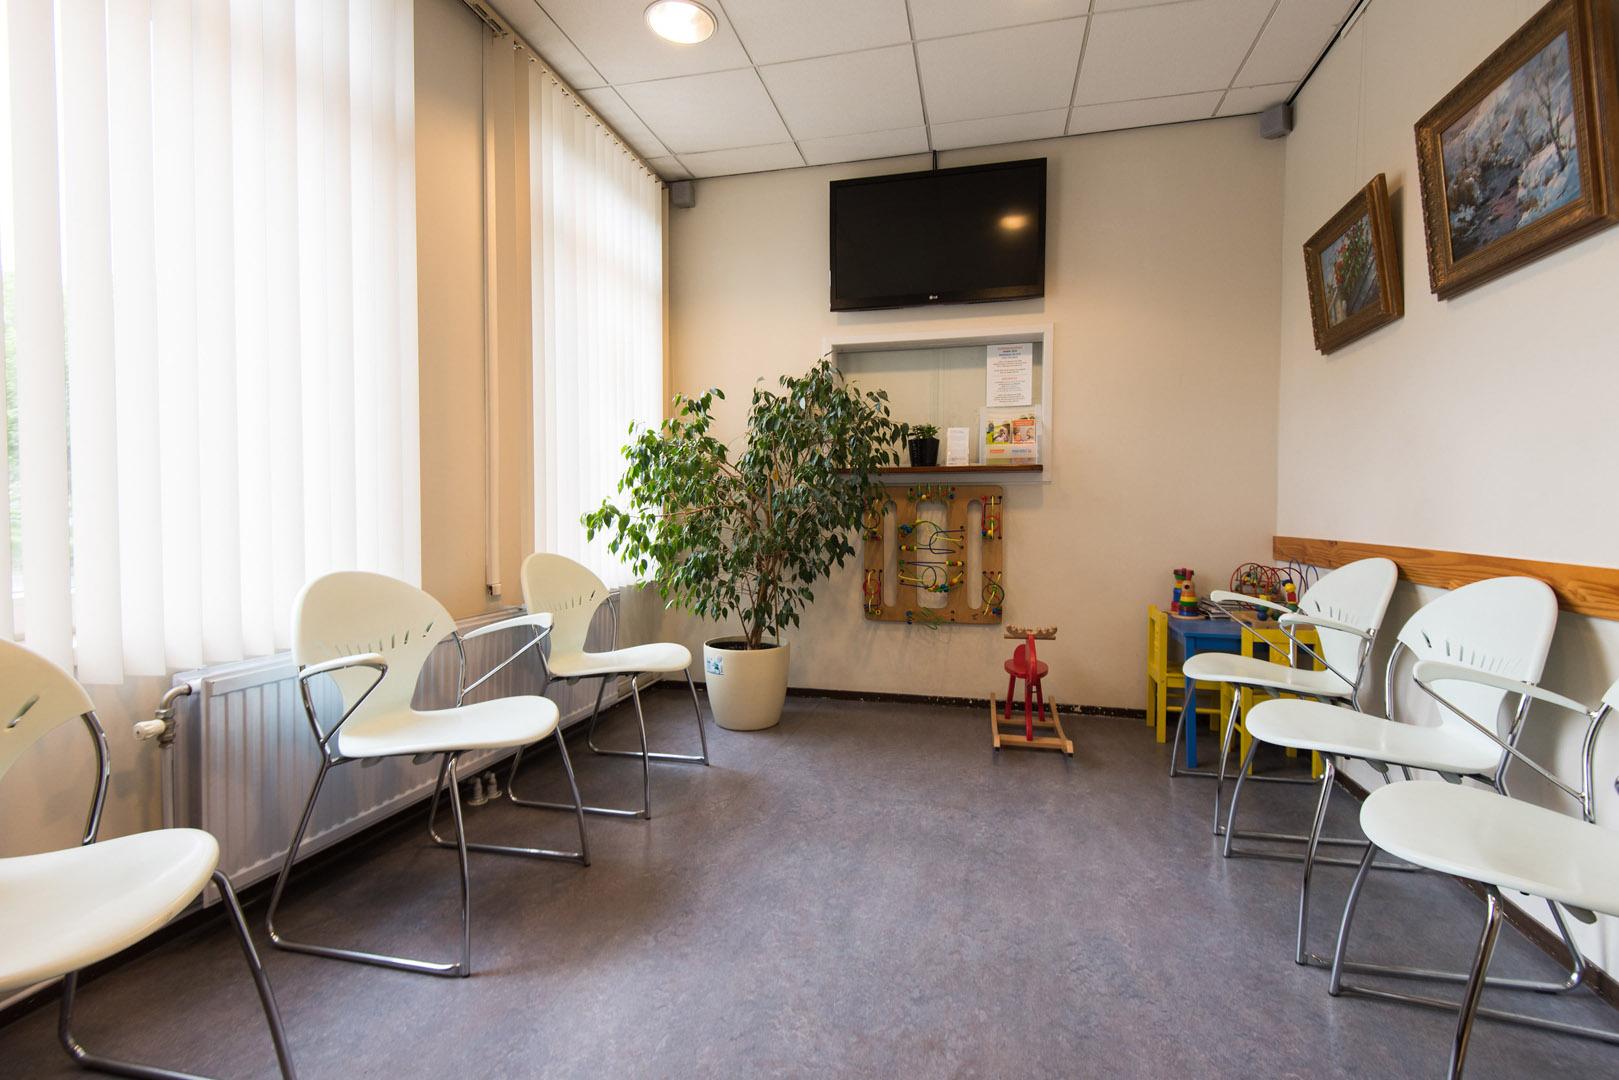 Rodin Dental Clinic wachtkamer